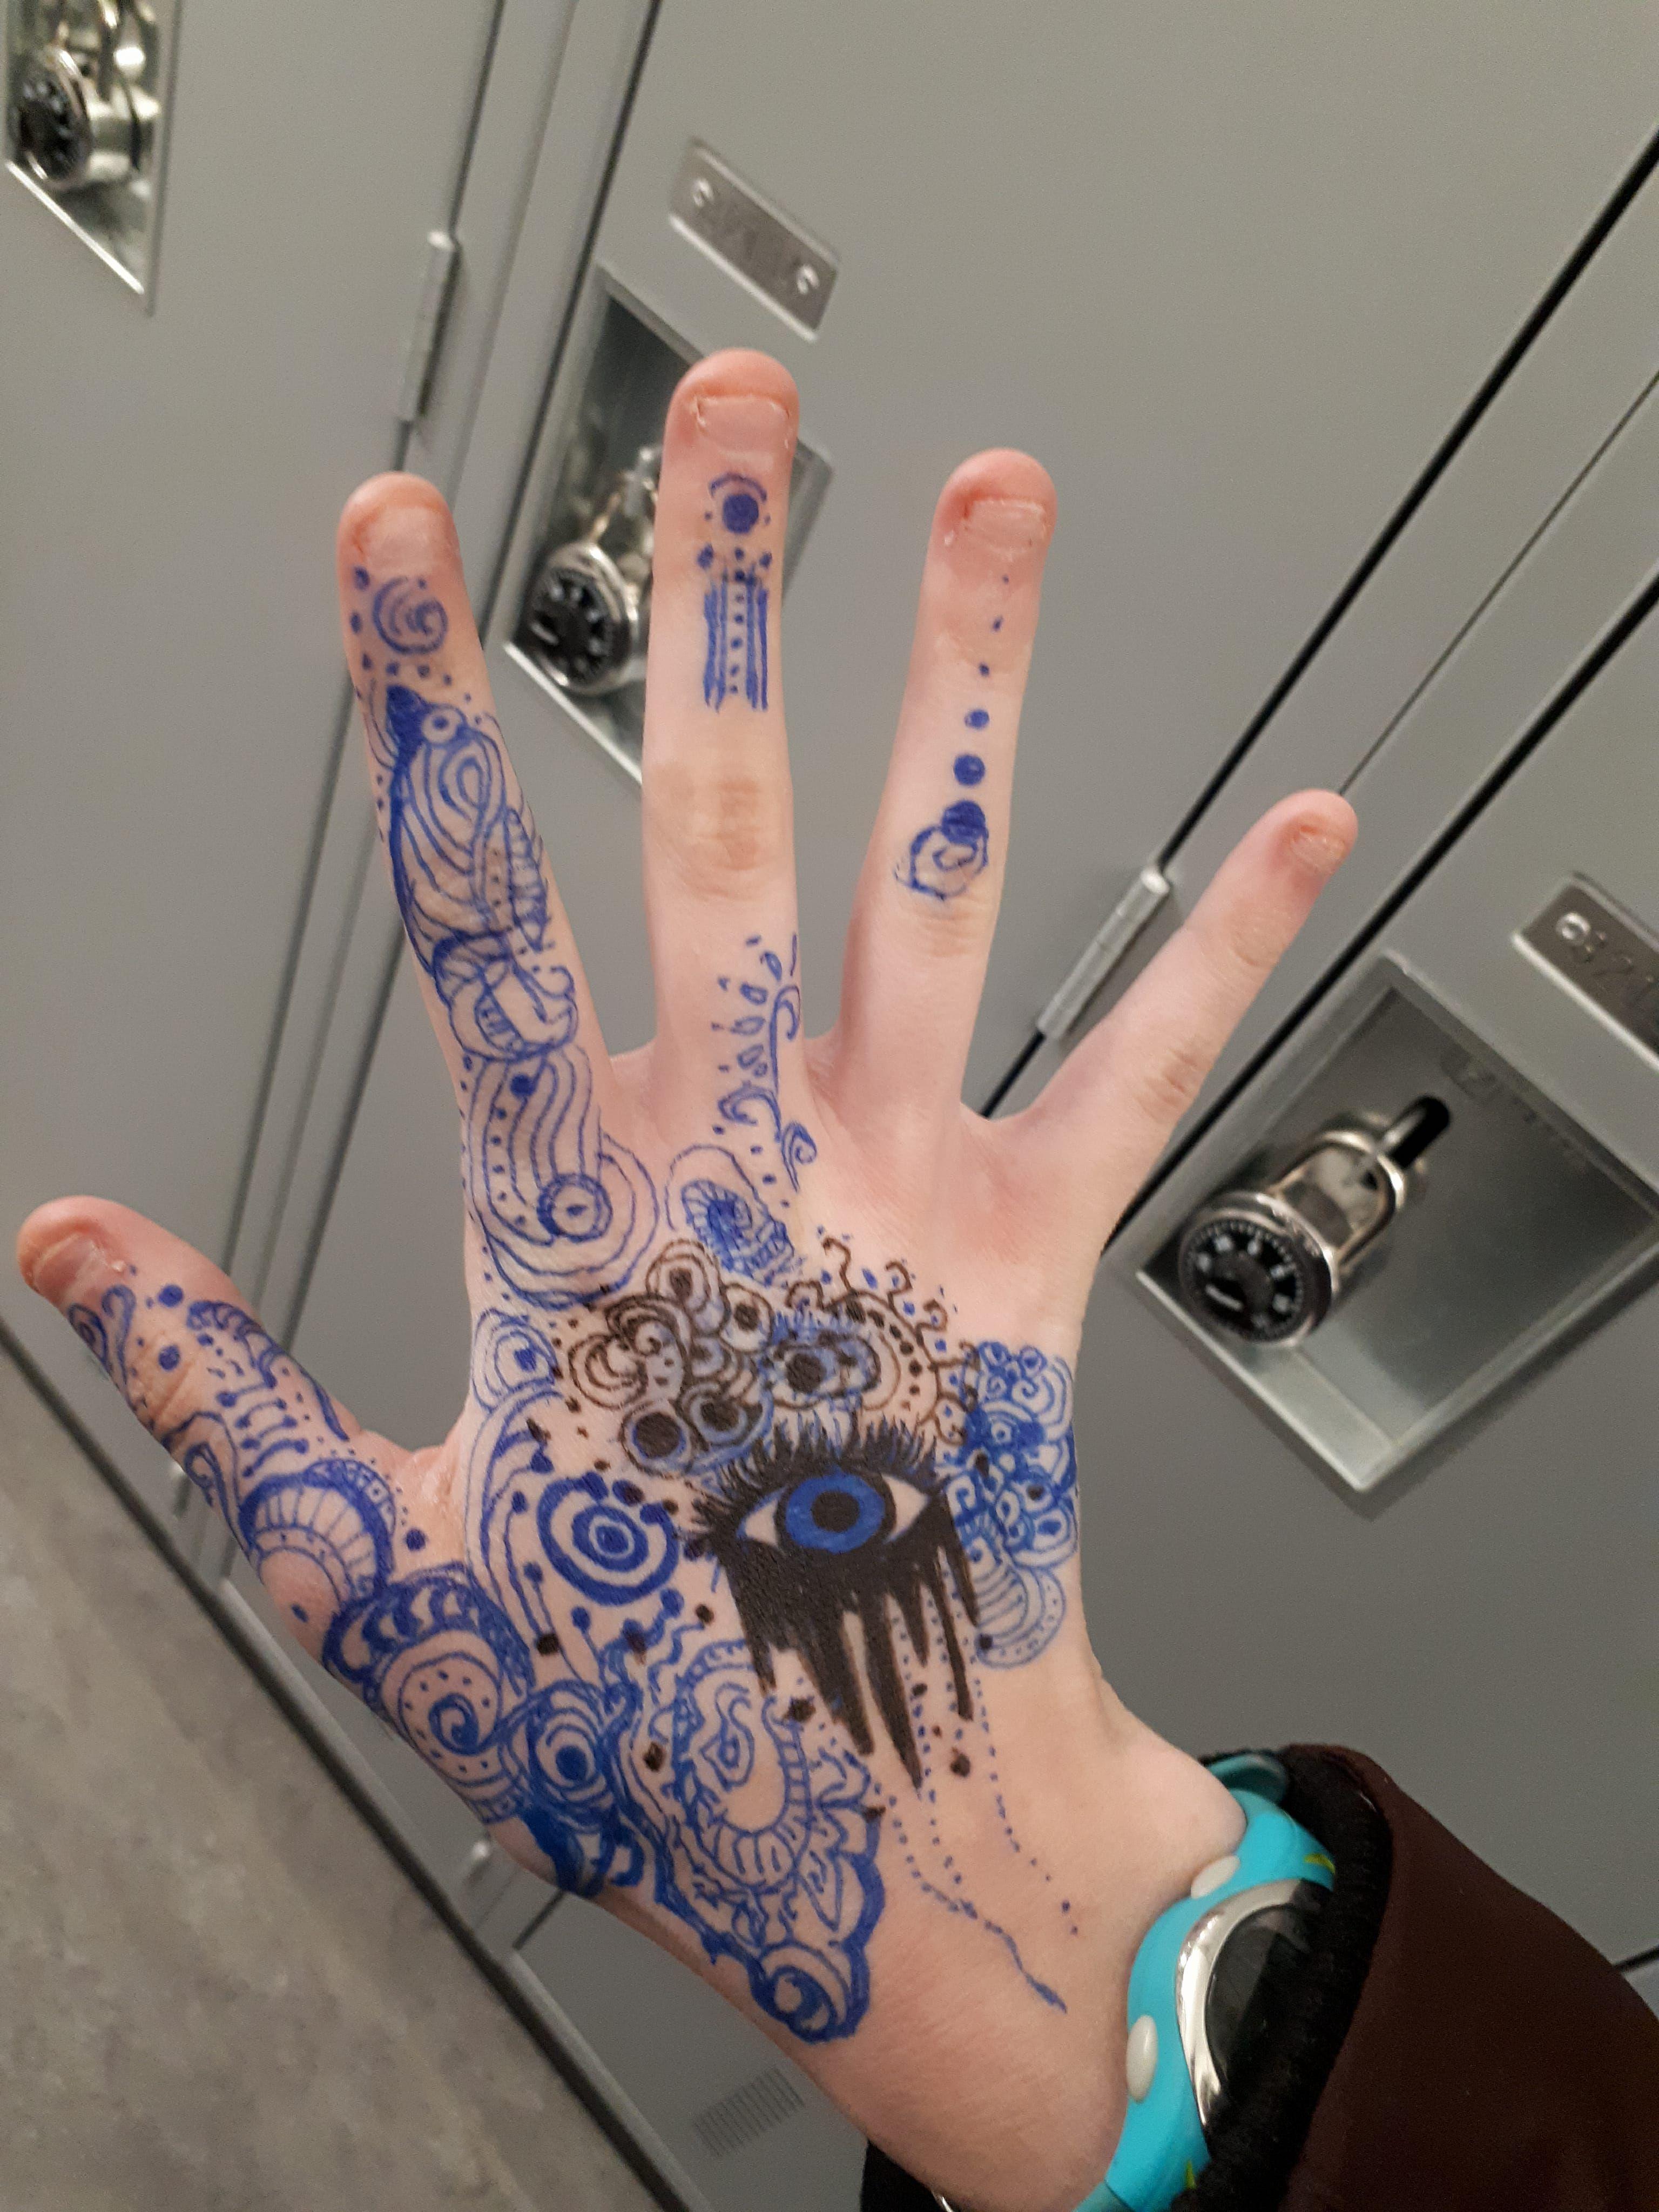 Pen Doodles On Hand Hand Art Hand Doodles Pen Doodles Hand Art